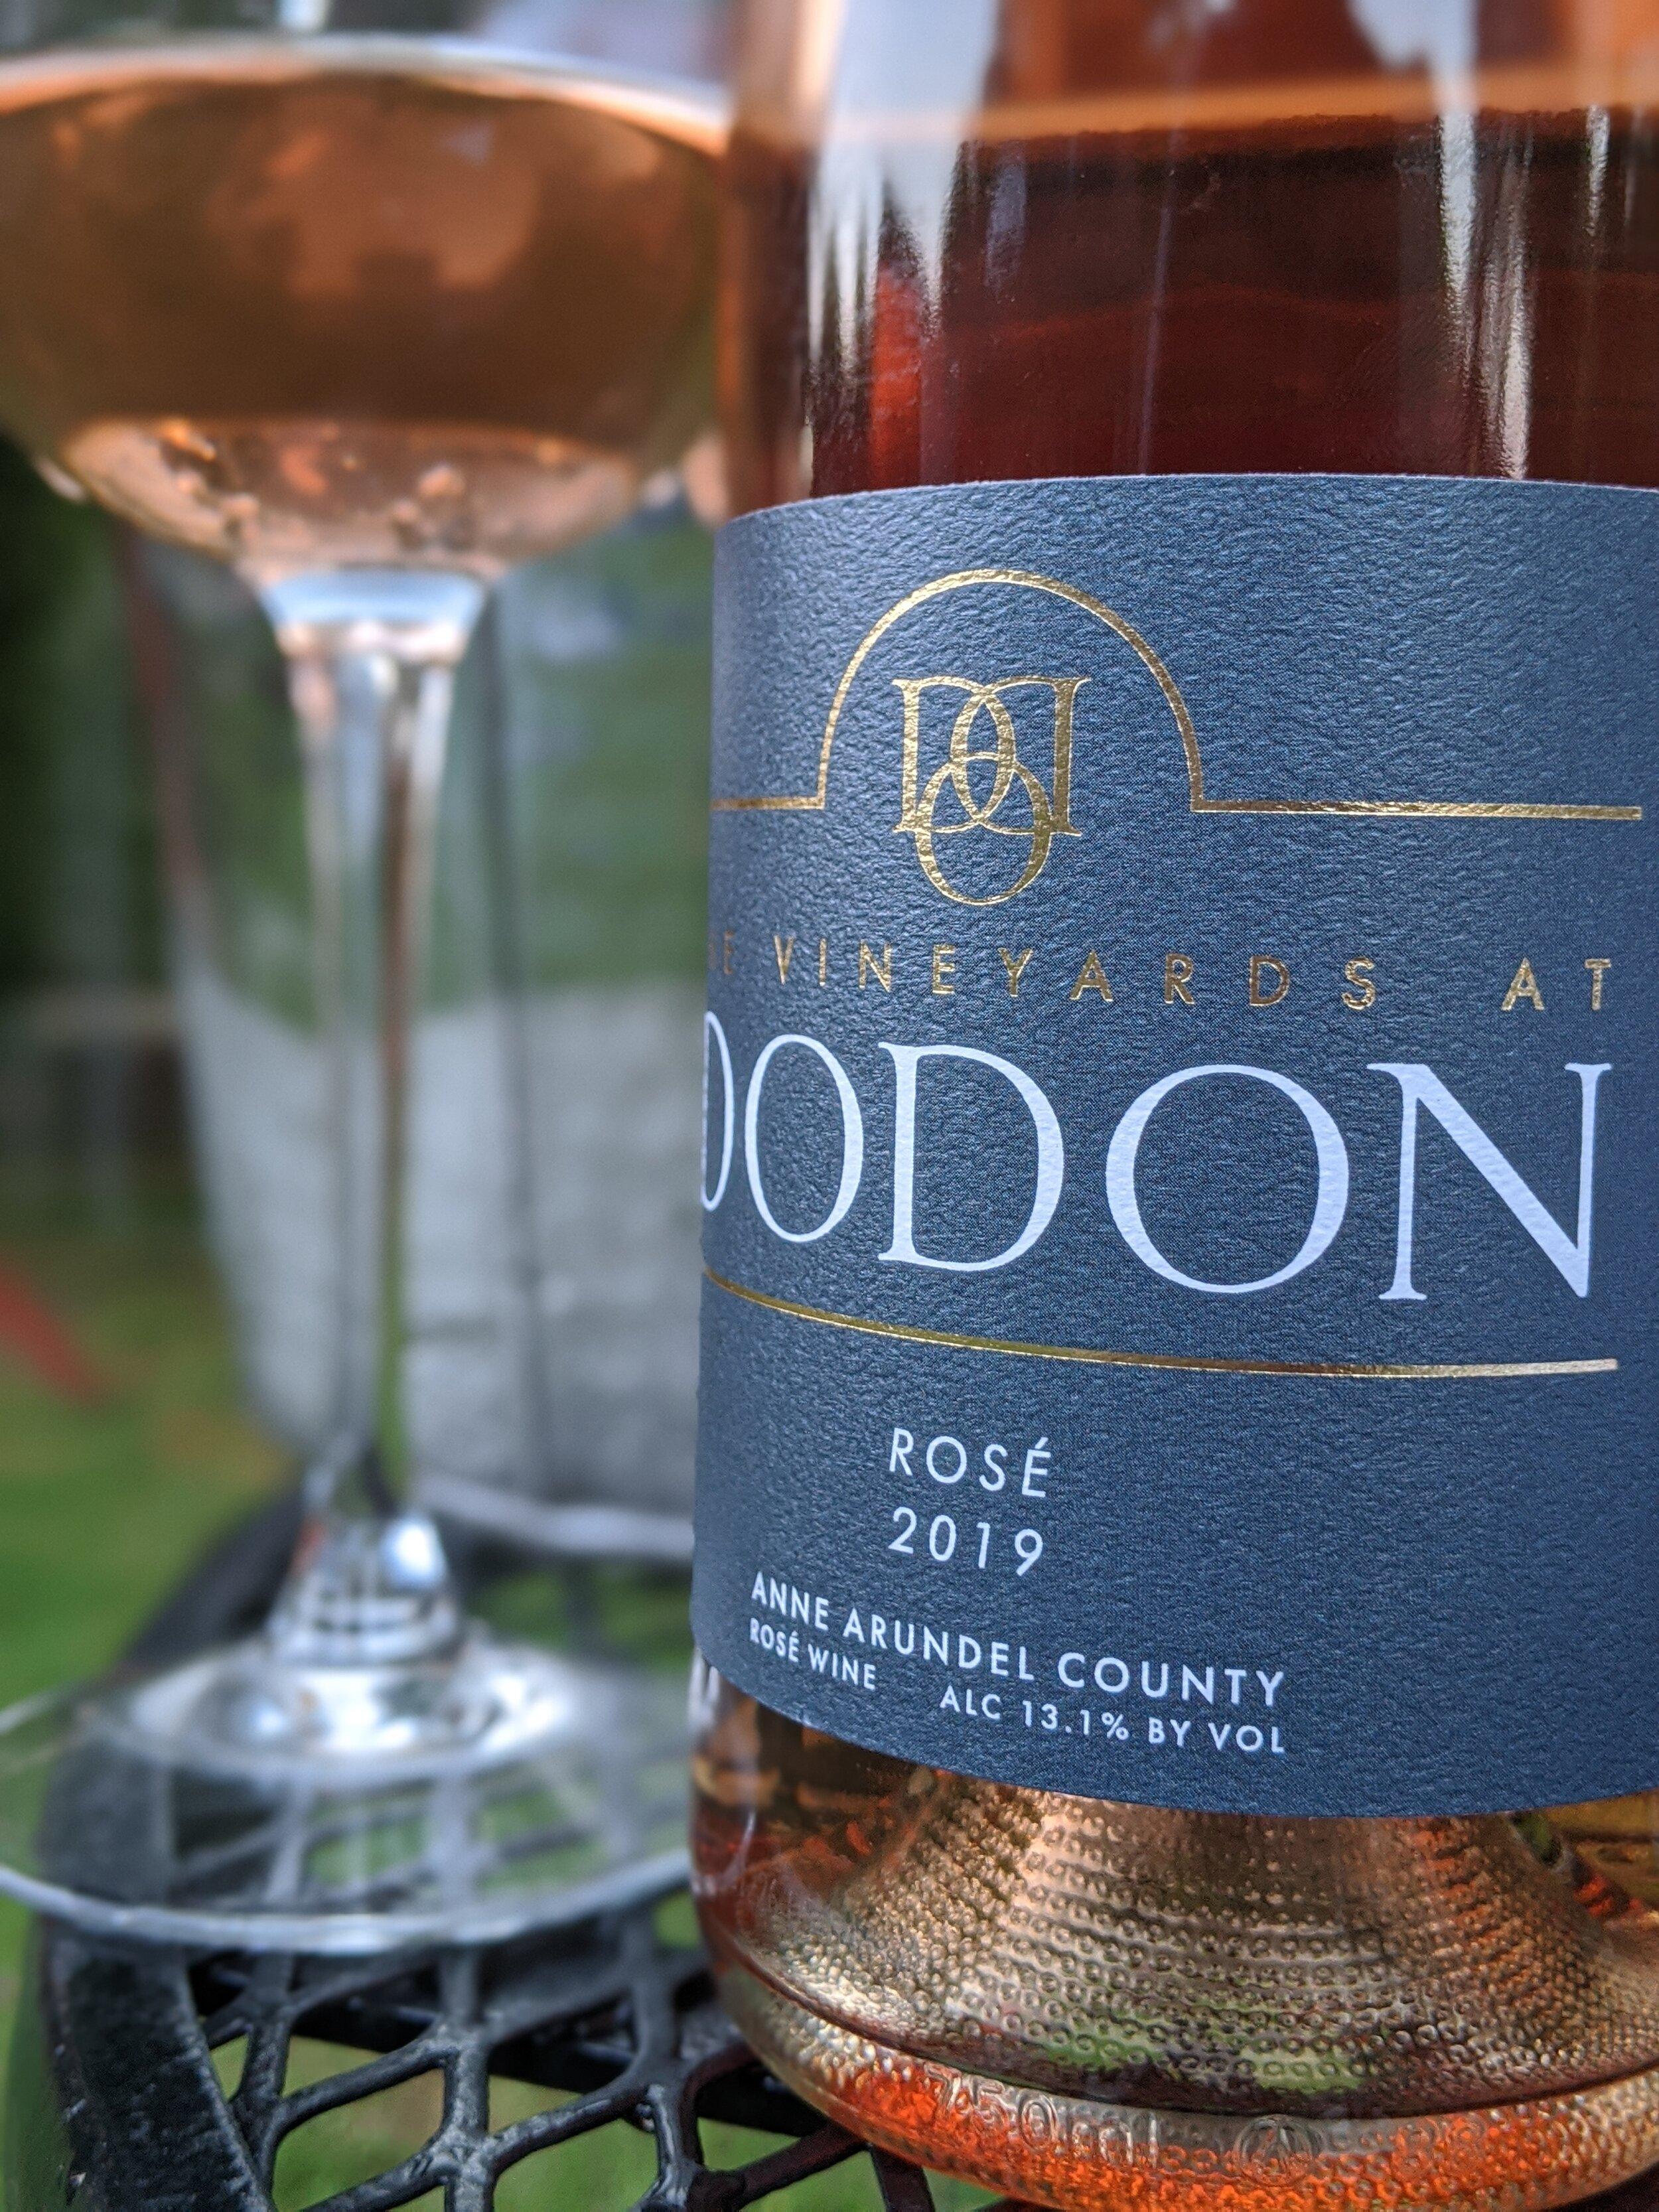 Day #4 The Vineyard at Dodon